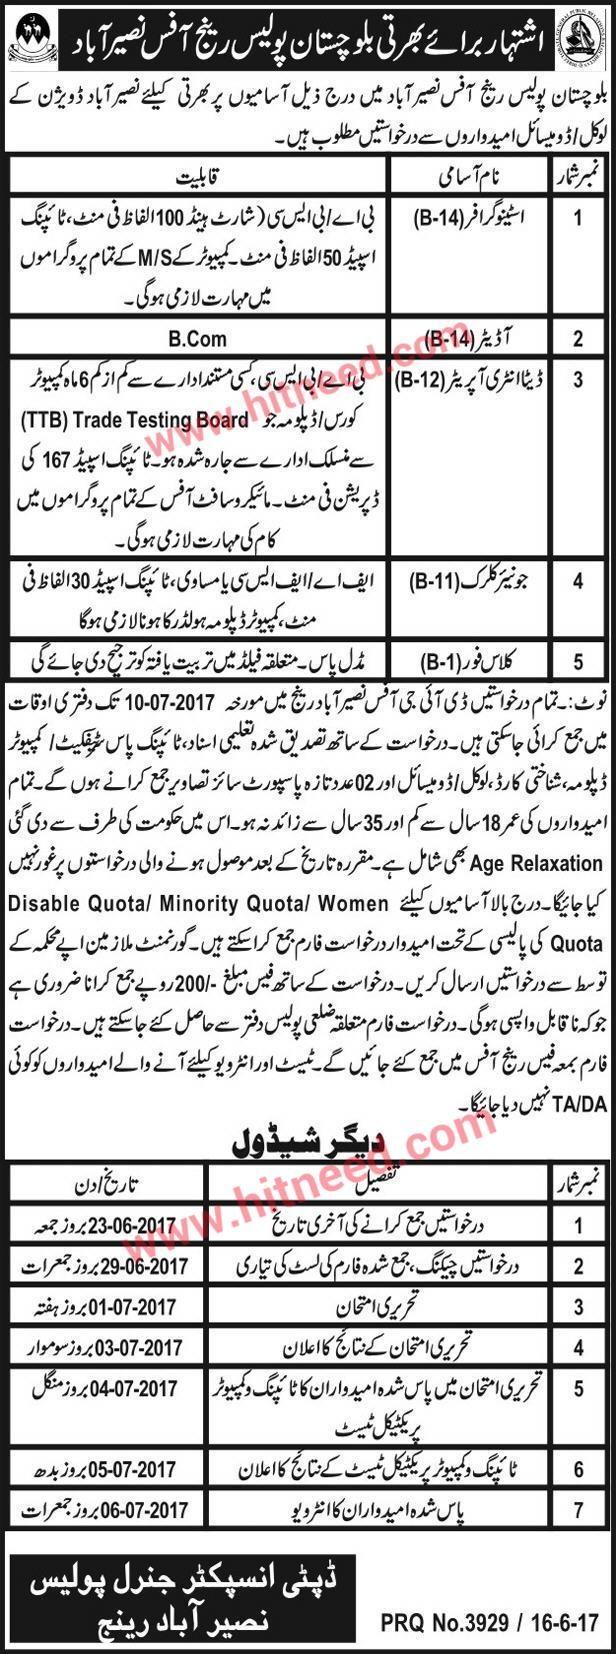 Balochistan Police, Range Office Naseerabad, Stenographer, Auditor & Other Jobs, Jun 2017 Expiring Soon! (23-6-2017)   #Auditor #Balochistan Police Jobs #Data Entry Operator #Junior Clerk #Naseerabad Jobs #Stenographer